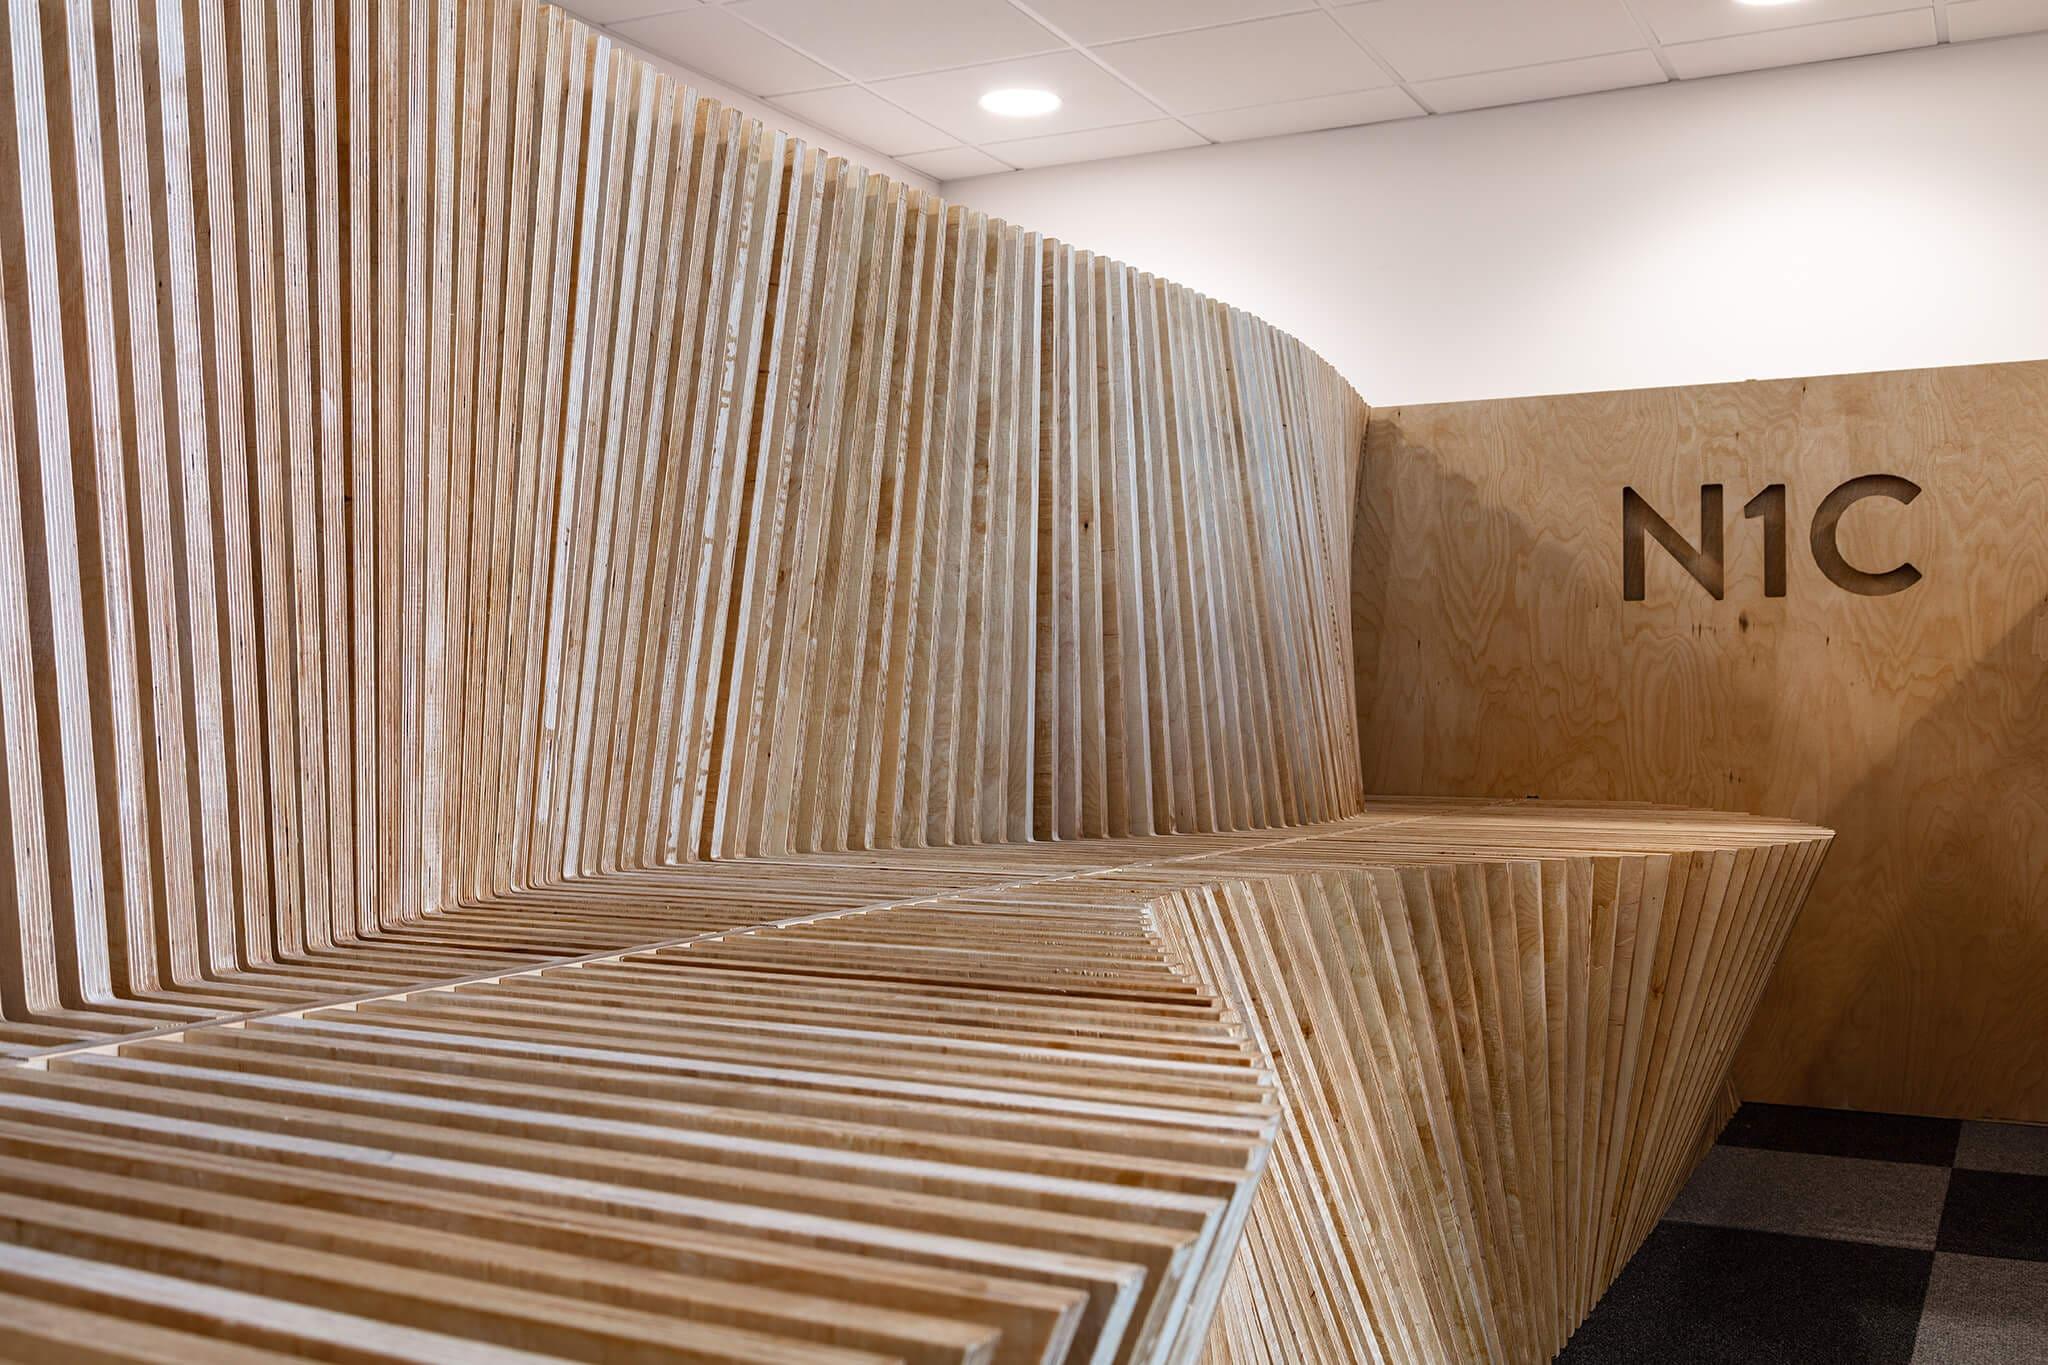 N1C installation (11)